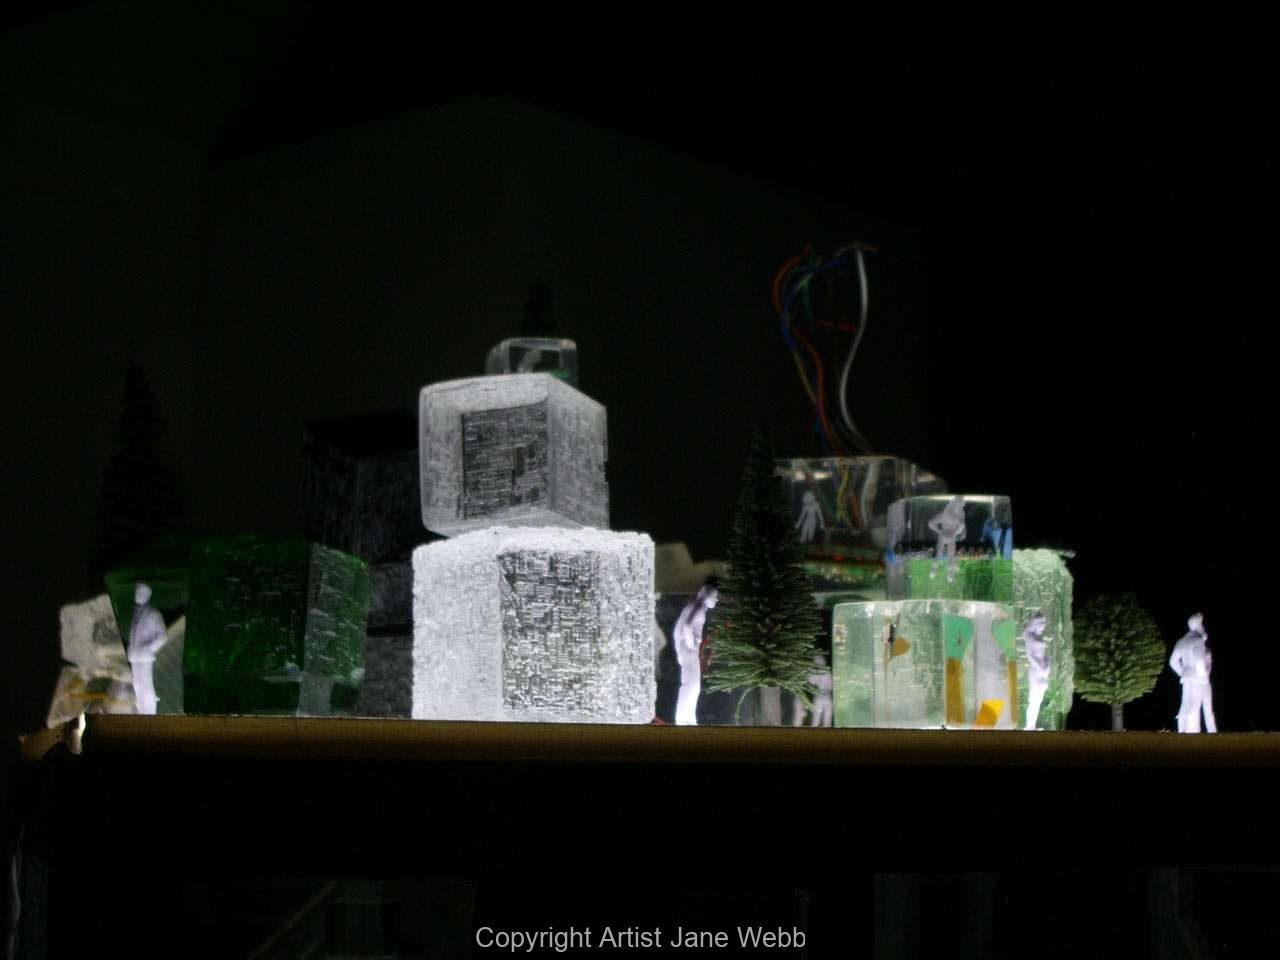 cast-resin-cyber-city-Jane-Webb